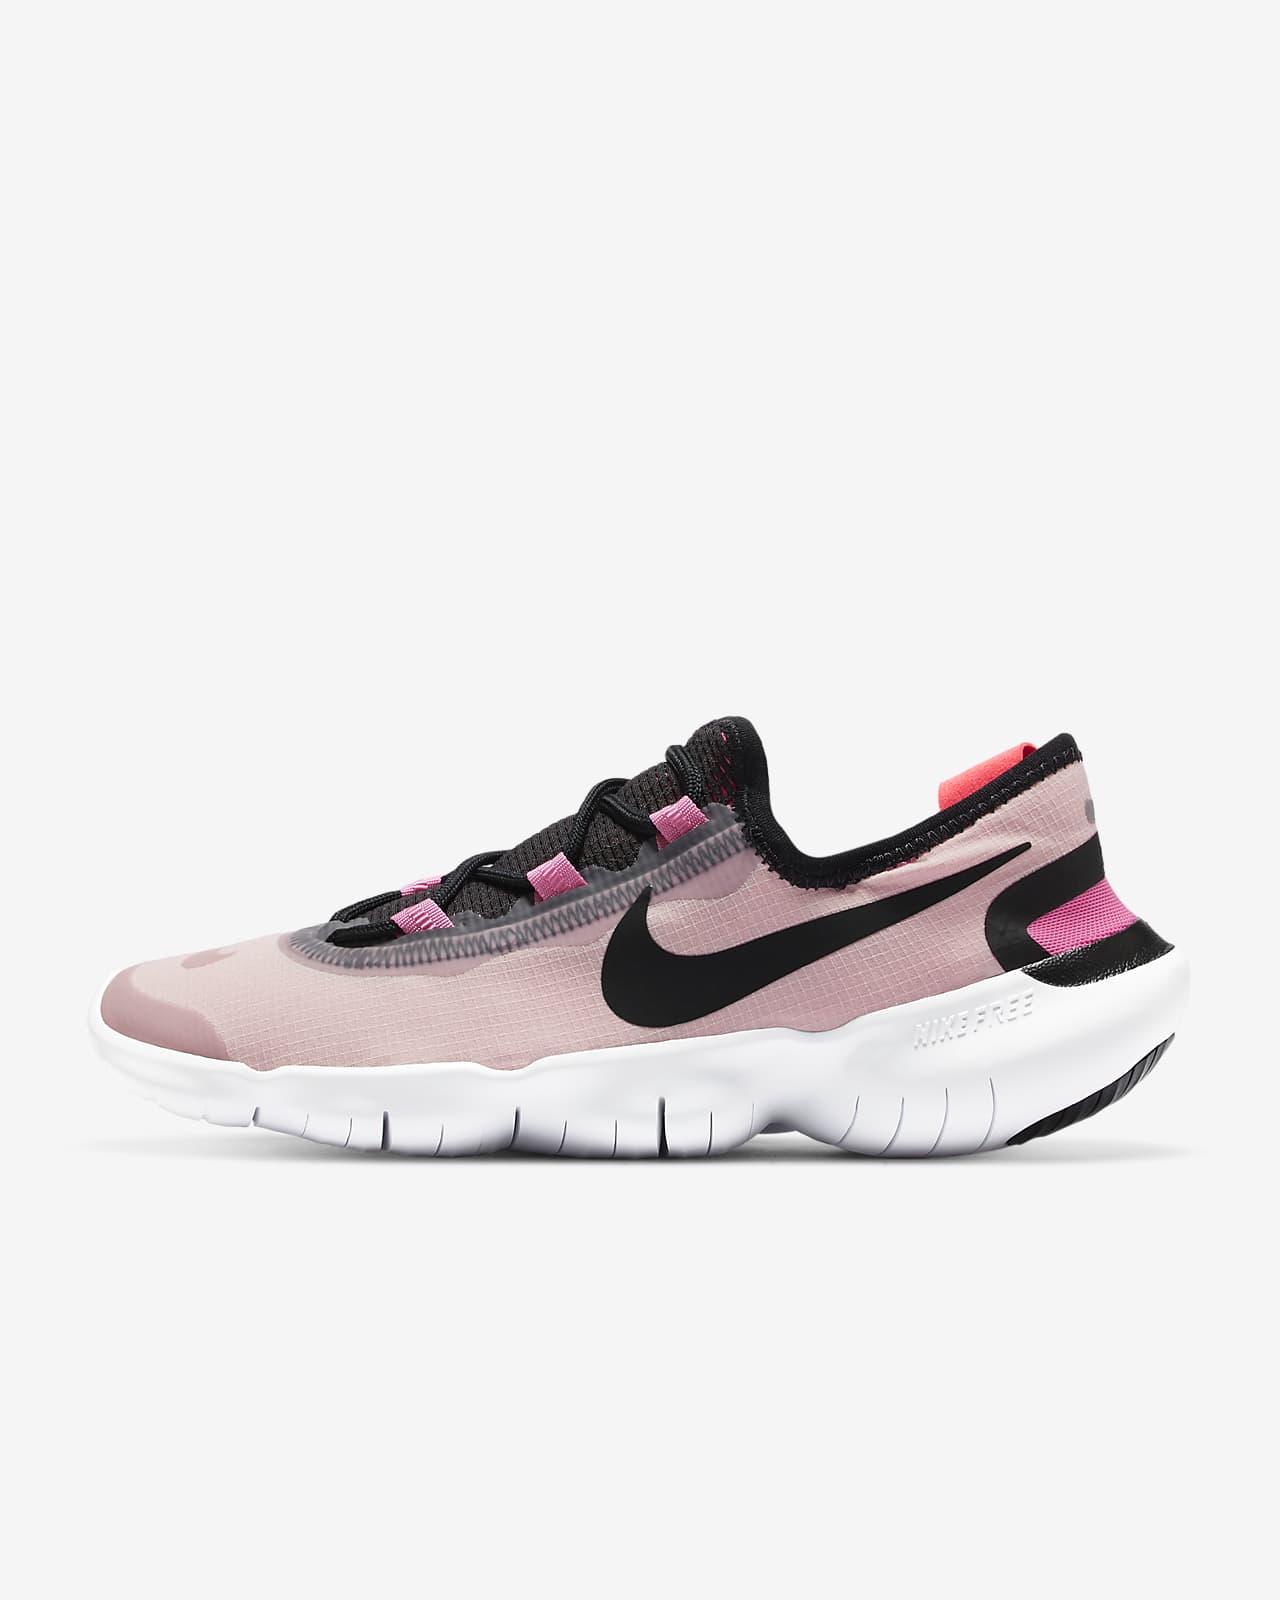 Nike Womens Free Rn 5.0 Running Shoes